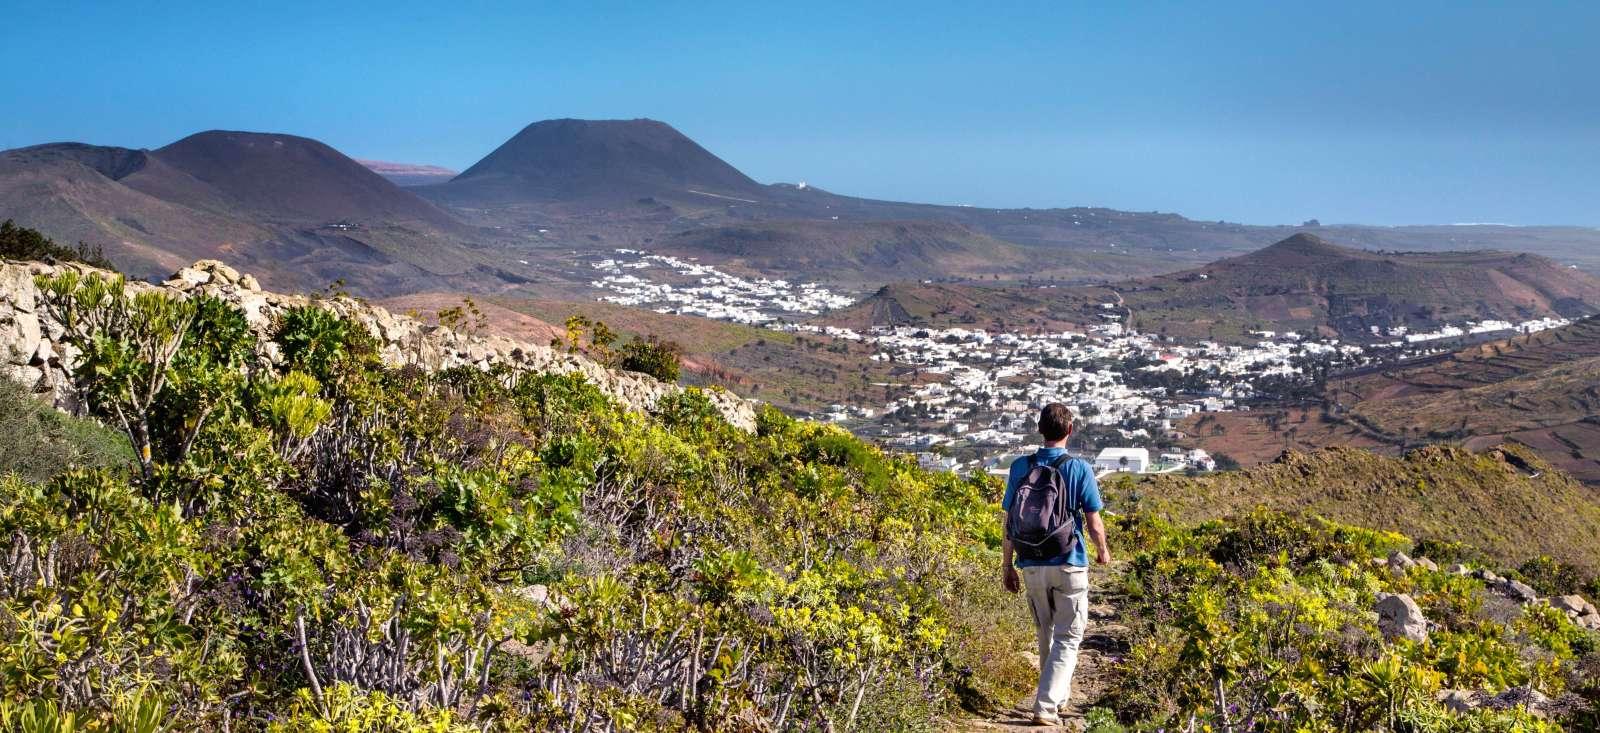 Voyage à pied : Volcans et sentiers de Lanzarote